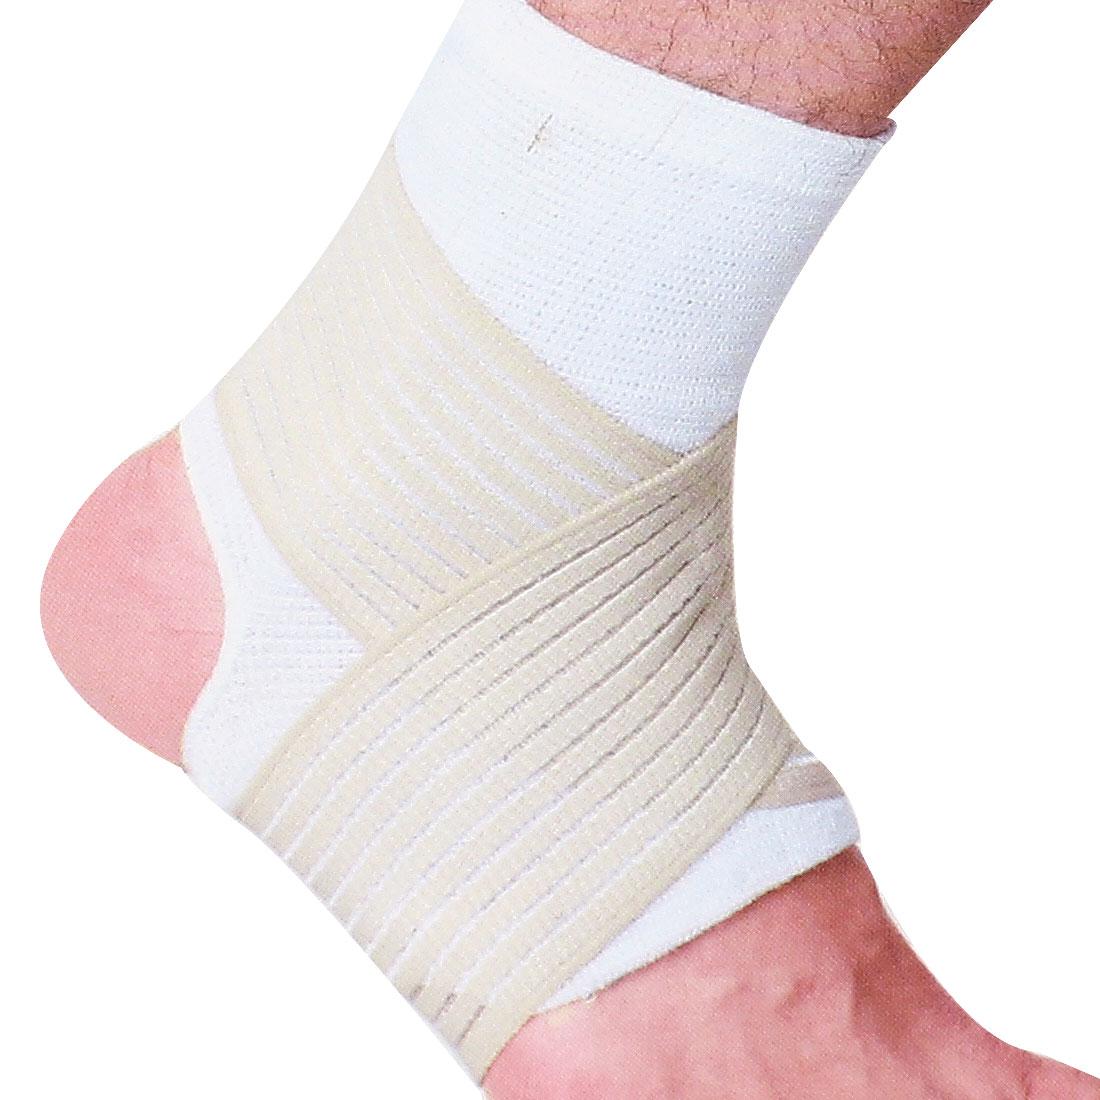 Hook Loop Closure Beige Striped Elastic Brace Ankle Support Bandage